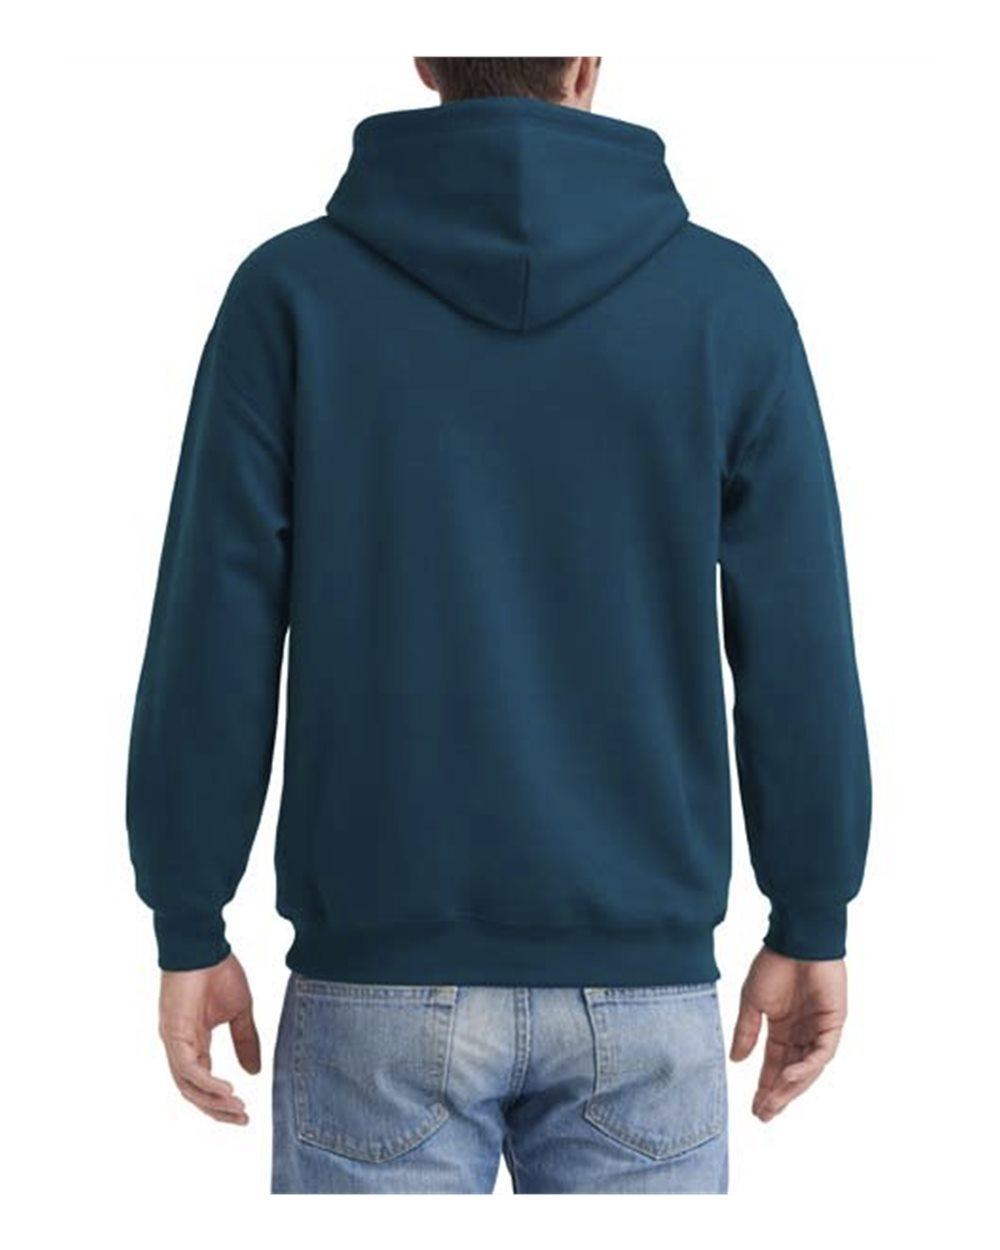 Gildan-Mens-Blank-Hoodie-Heavy-Blend-Hooded-Sweatshirt-Solid-18500-up-to-5XL thumbnail 48